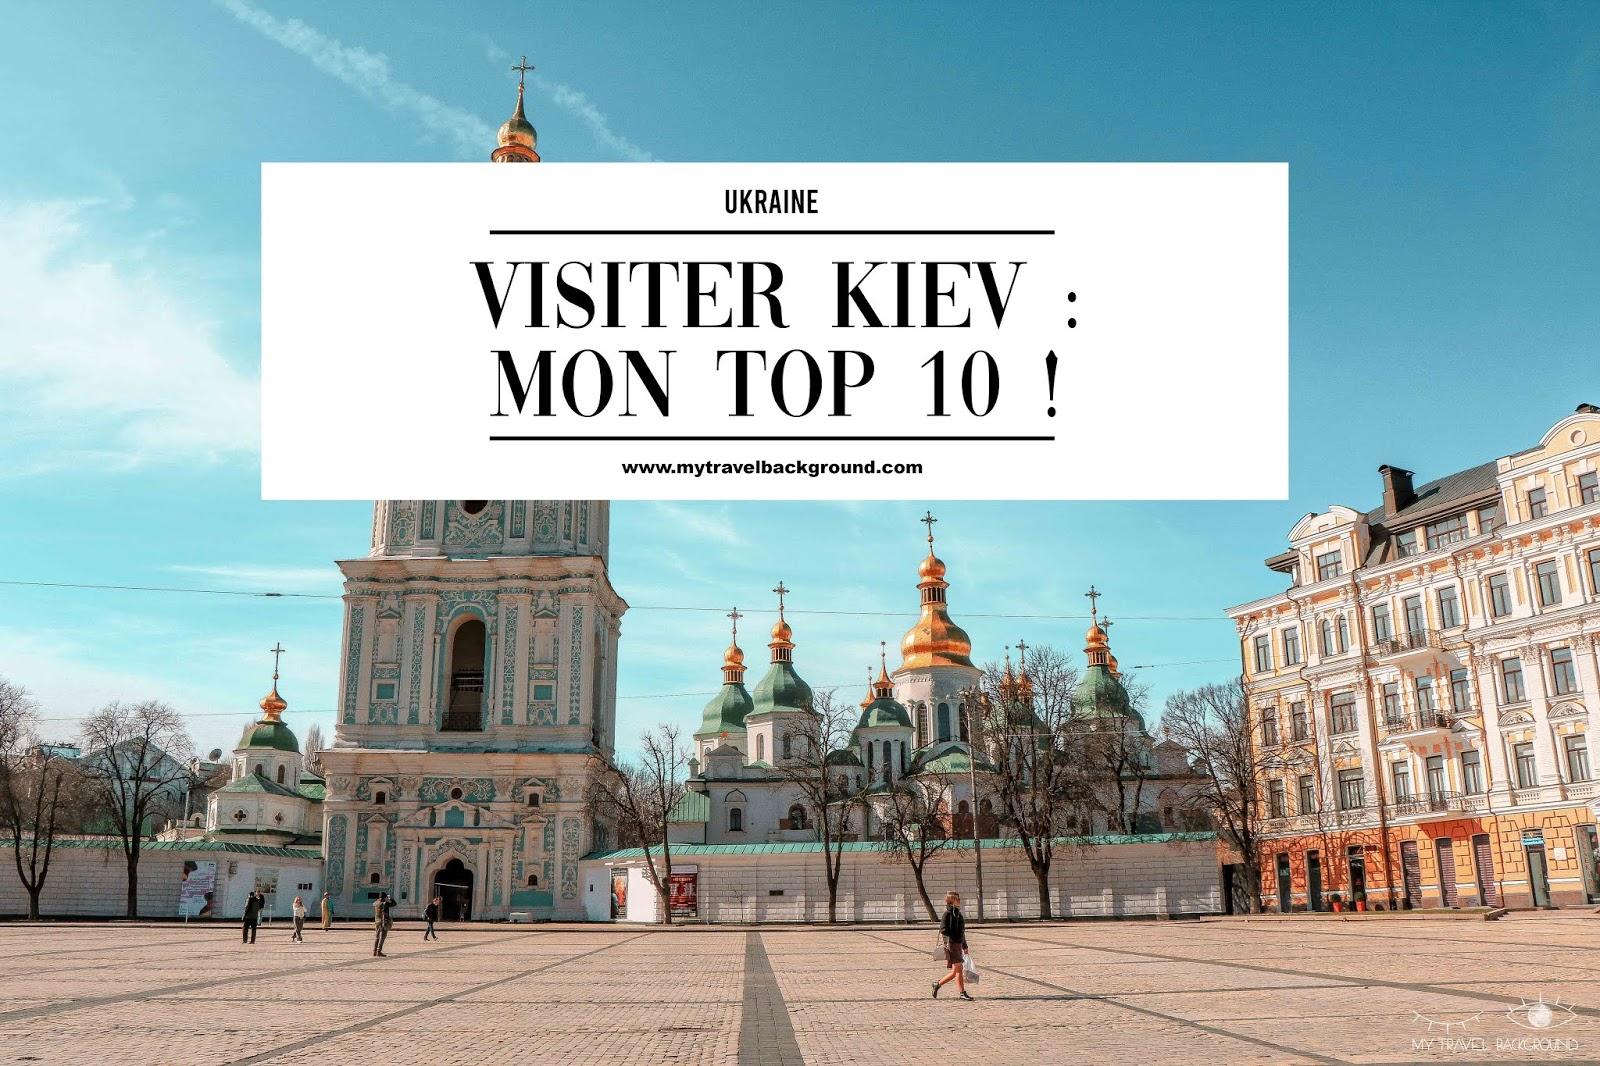 My Travel Background : visiter Kiev, la capitale de l'Ukraine, top 10